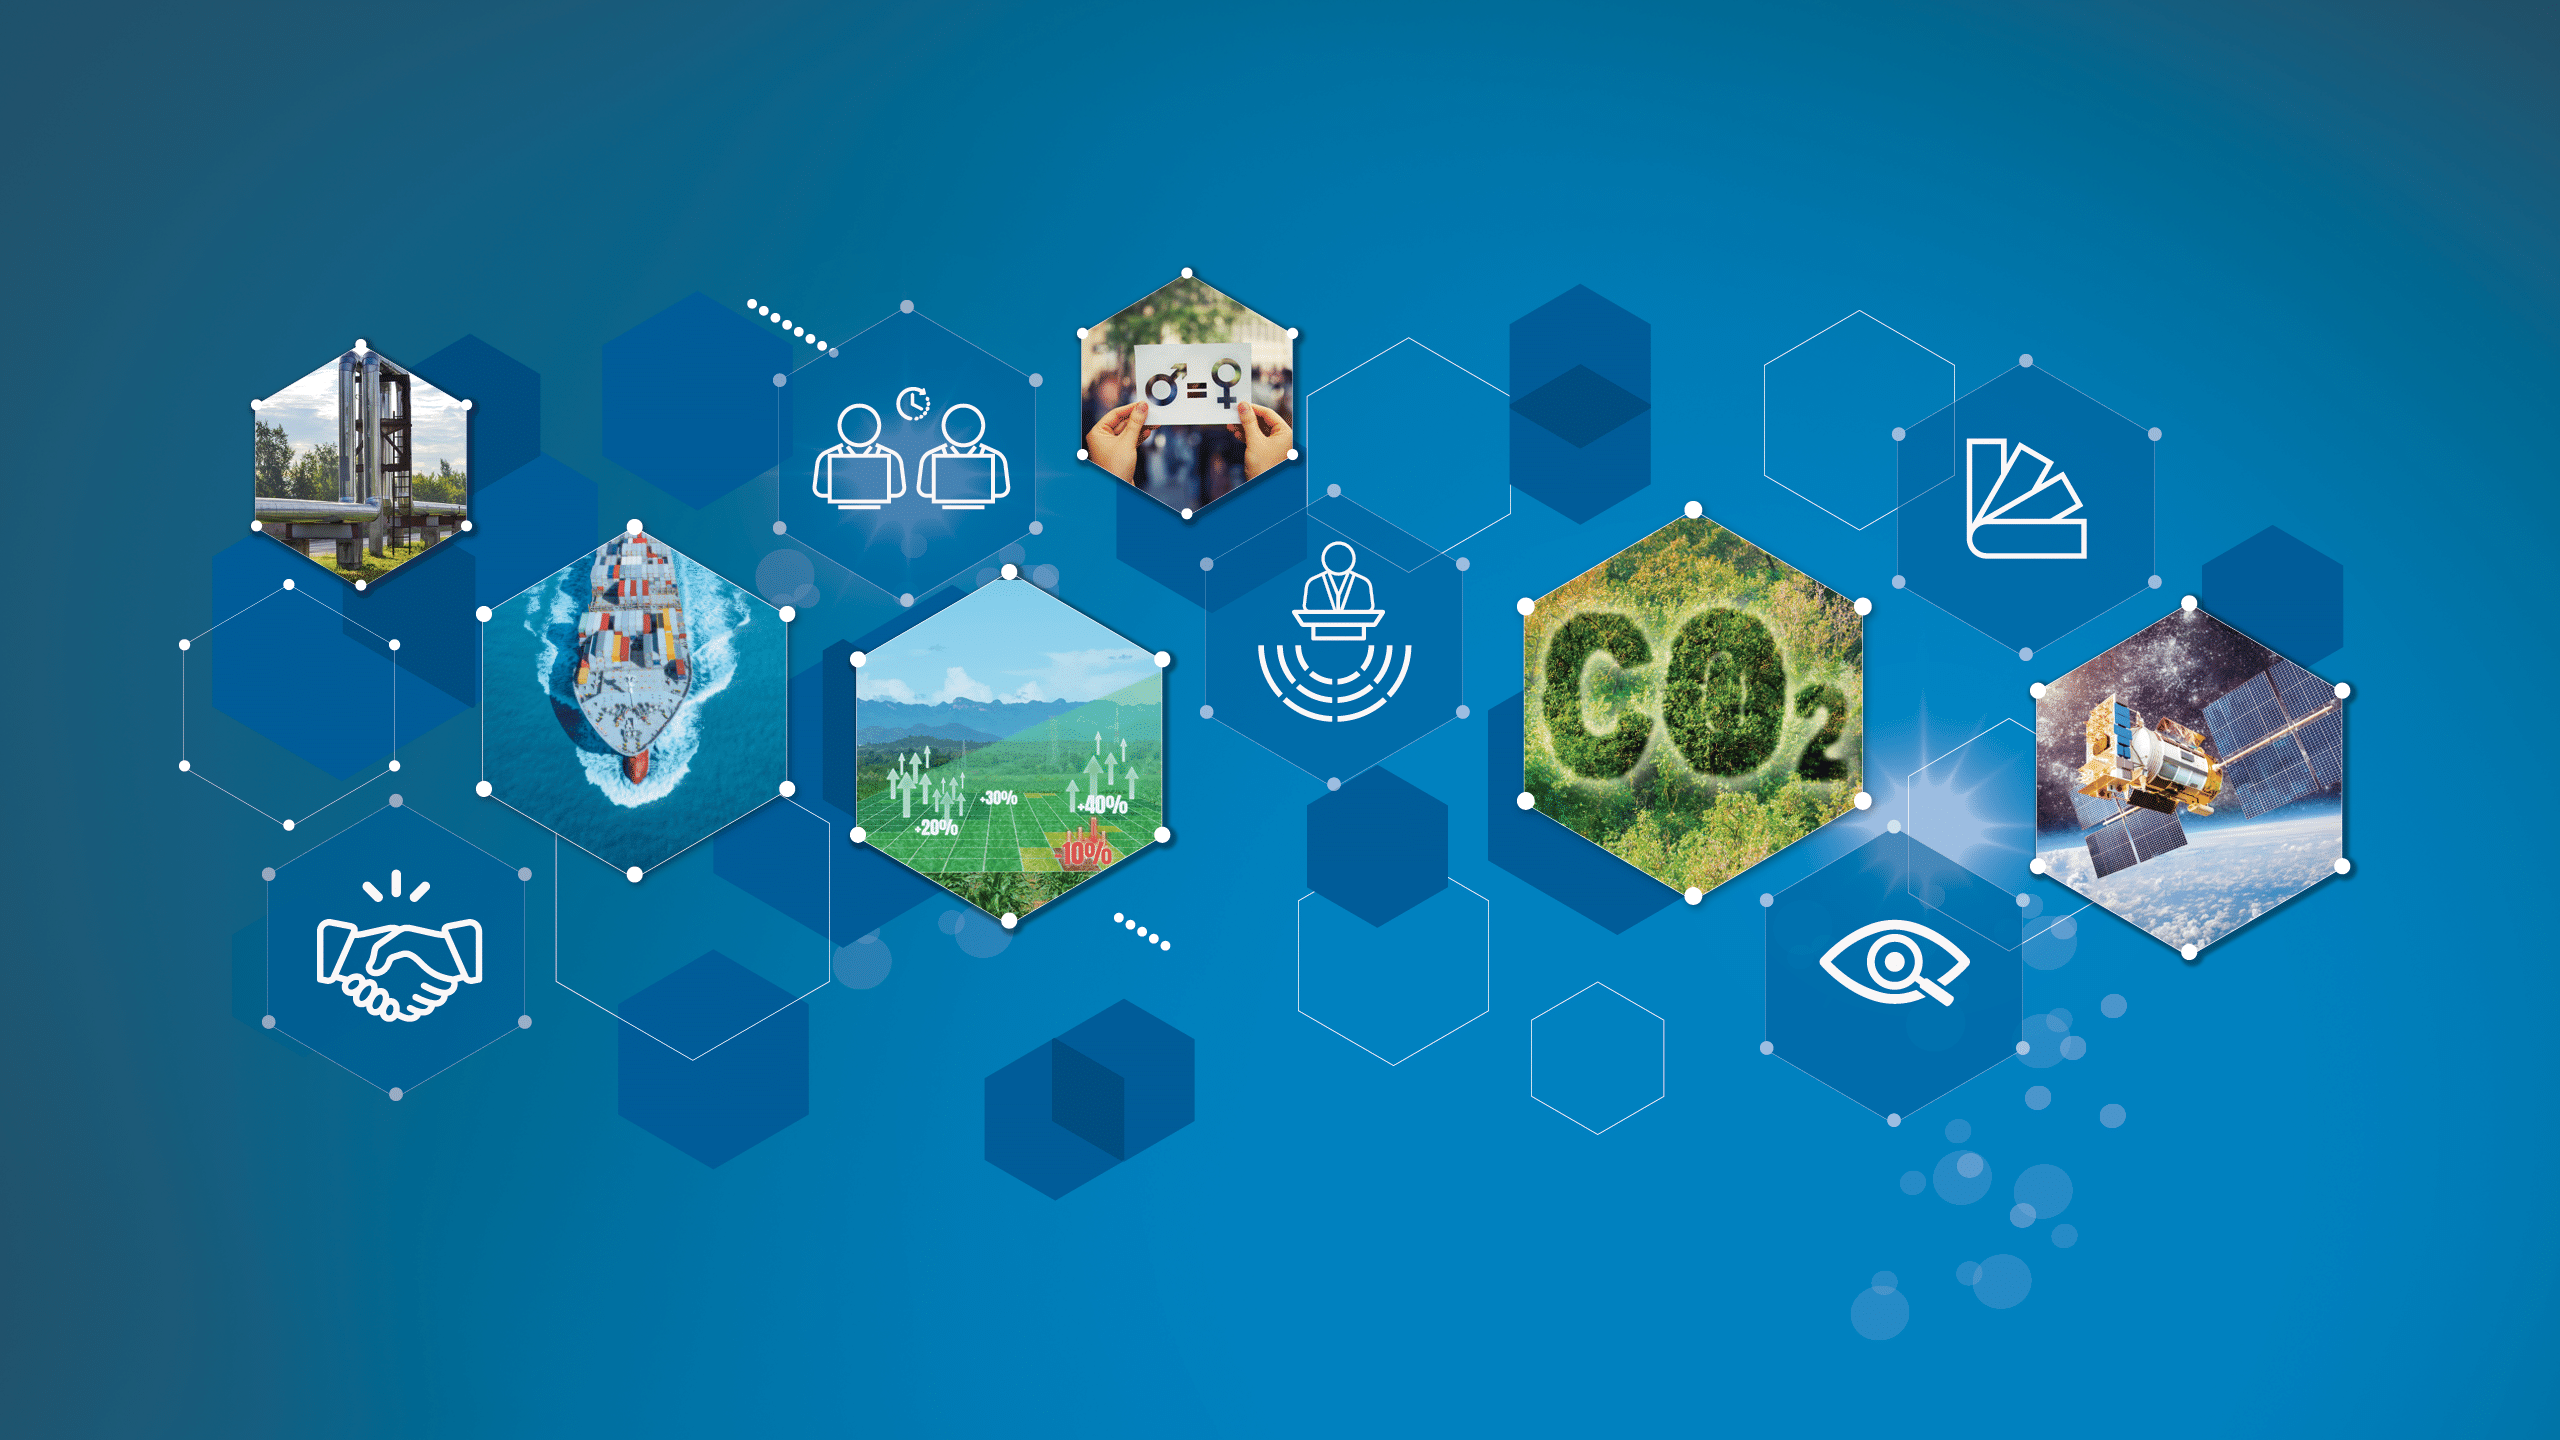 G-STIC 2020 activities